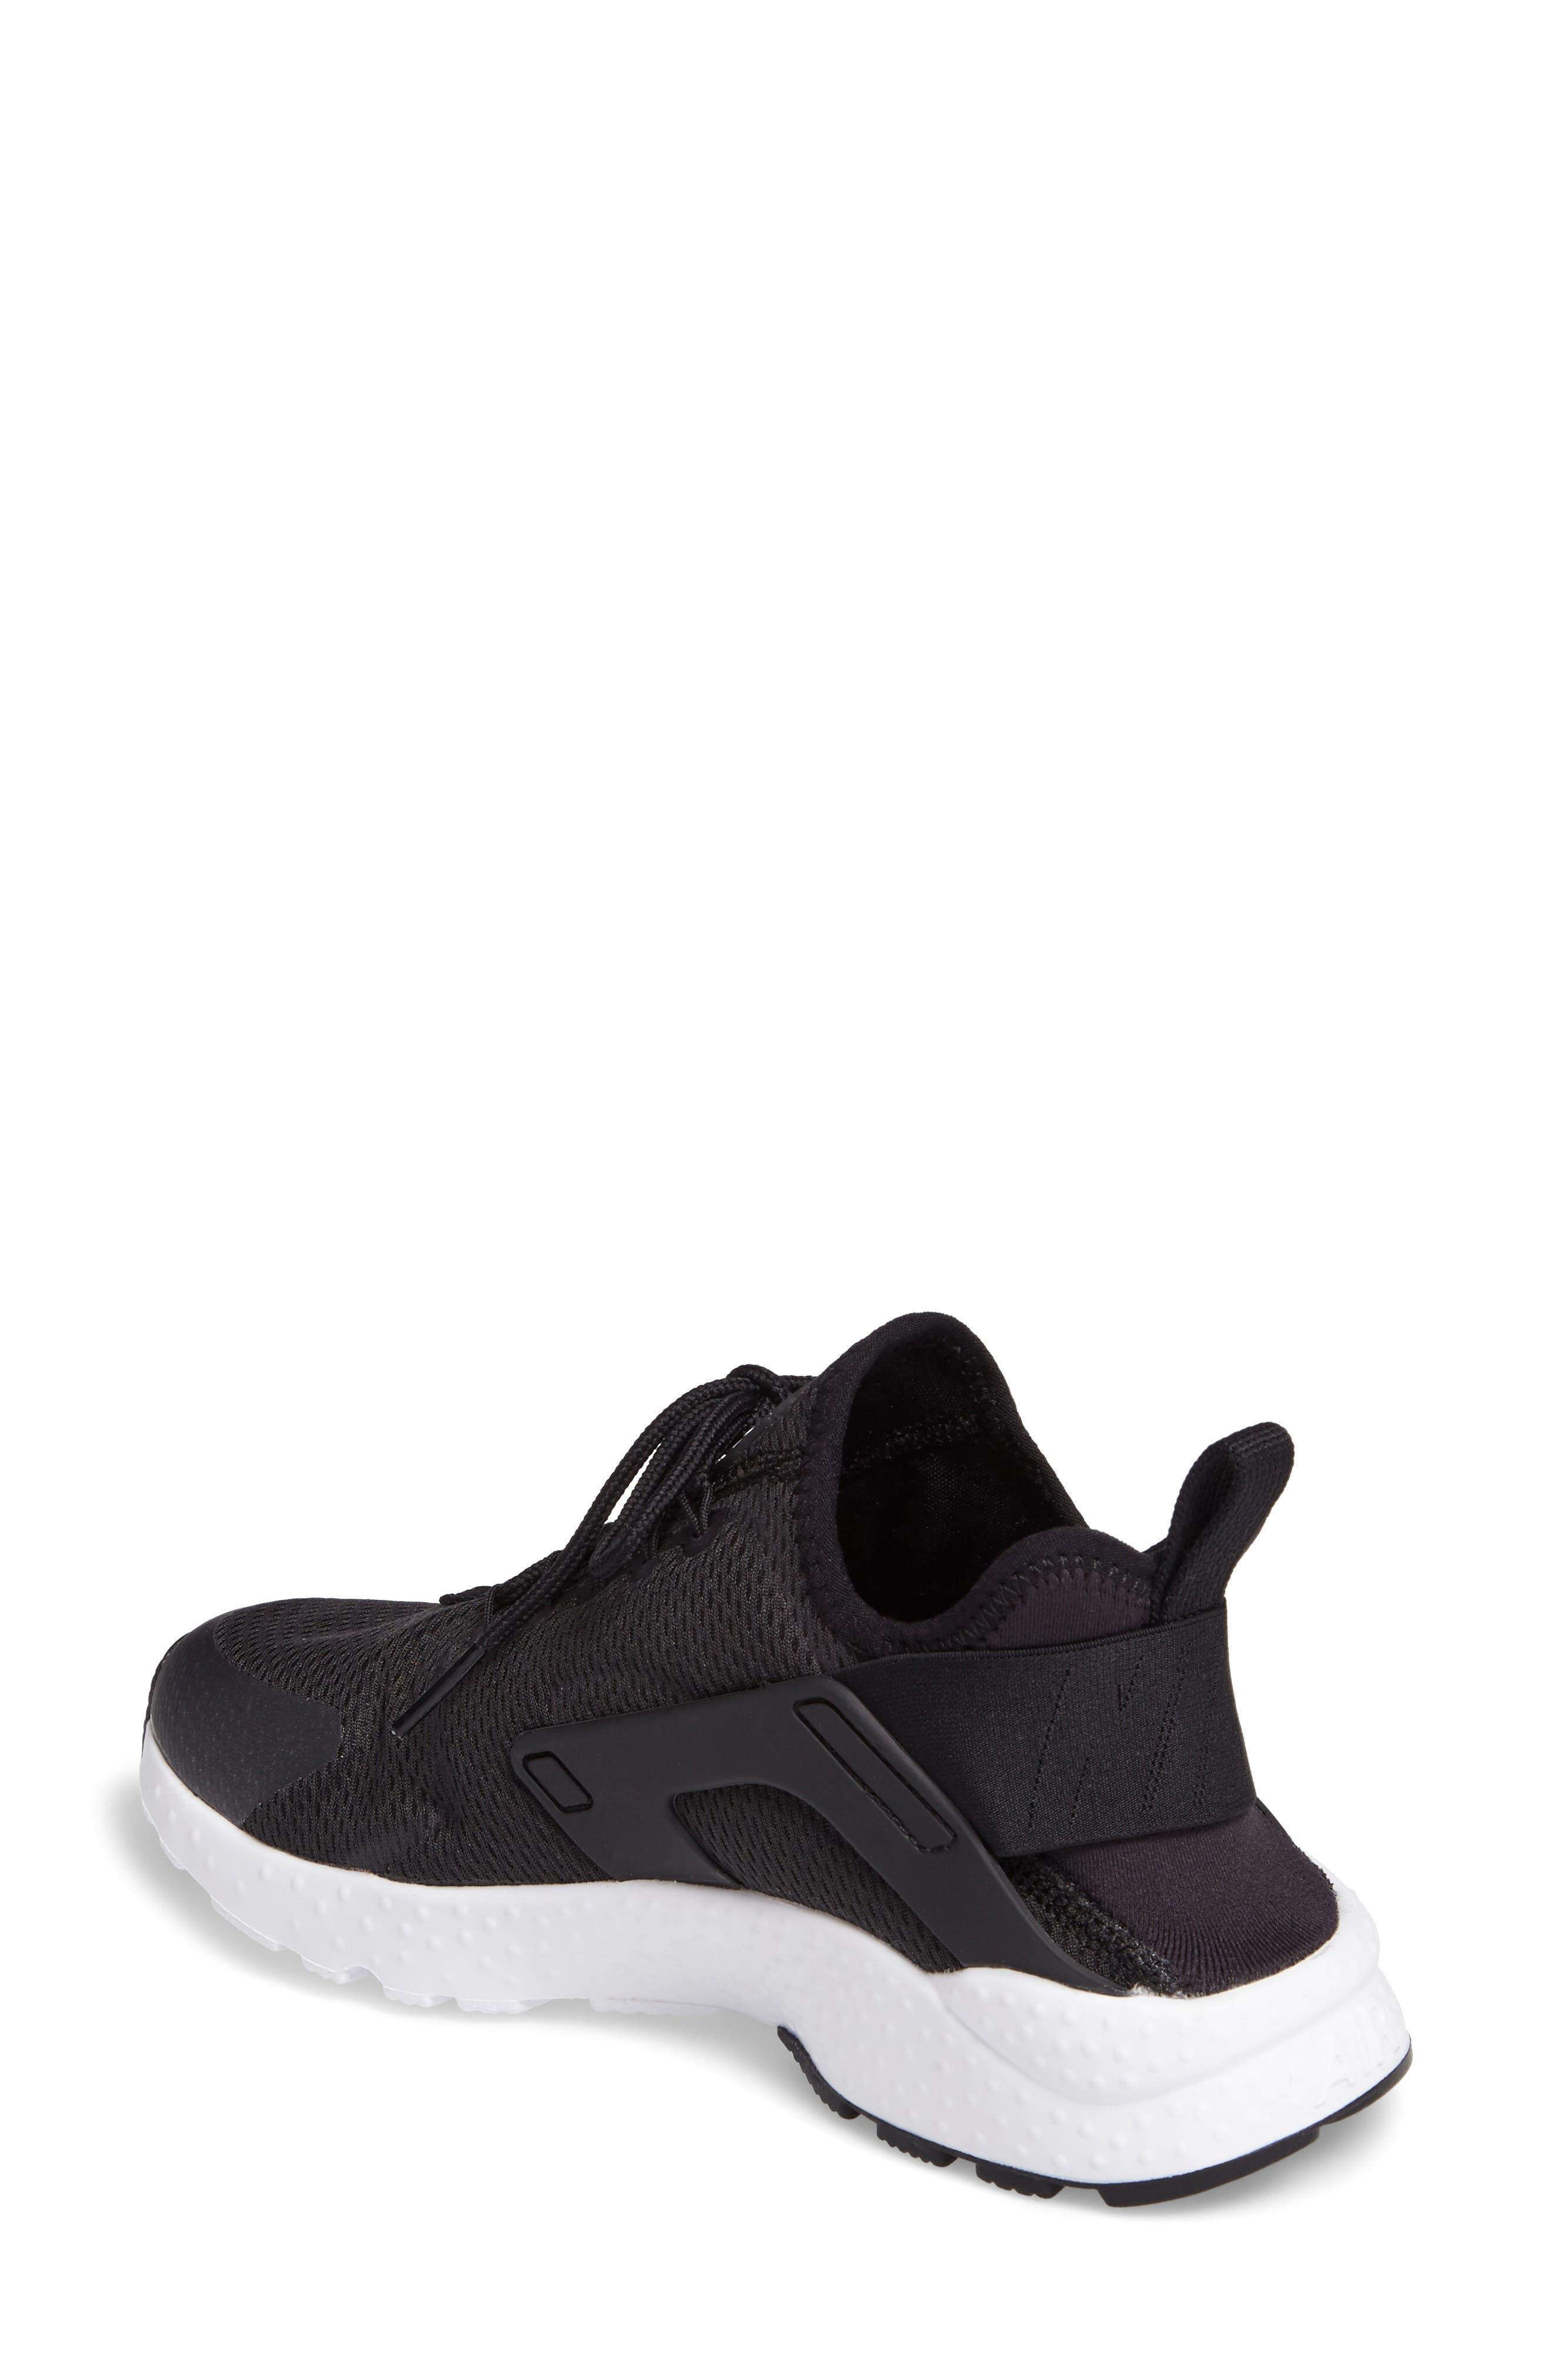 Air Huarache Sneaker,                             Alternate thumbnail 48, color,